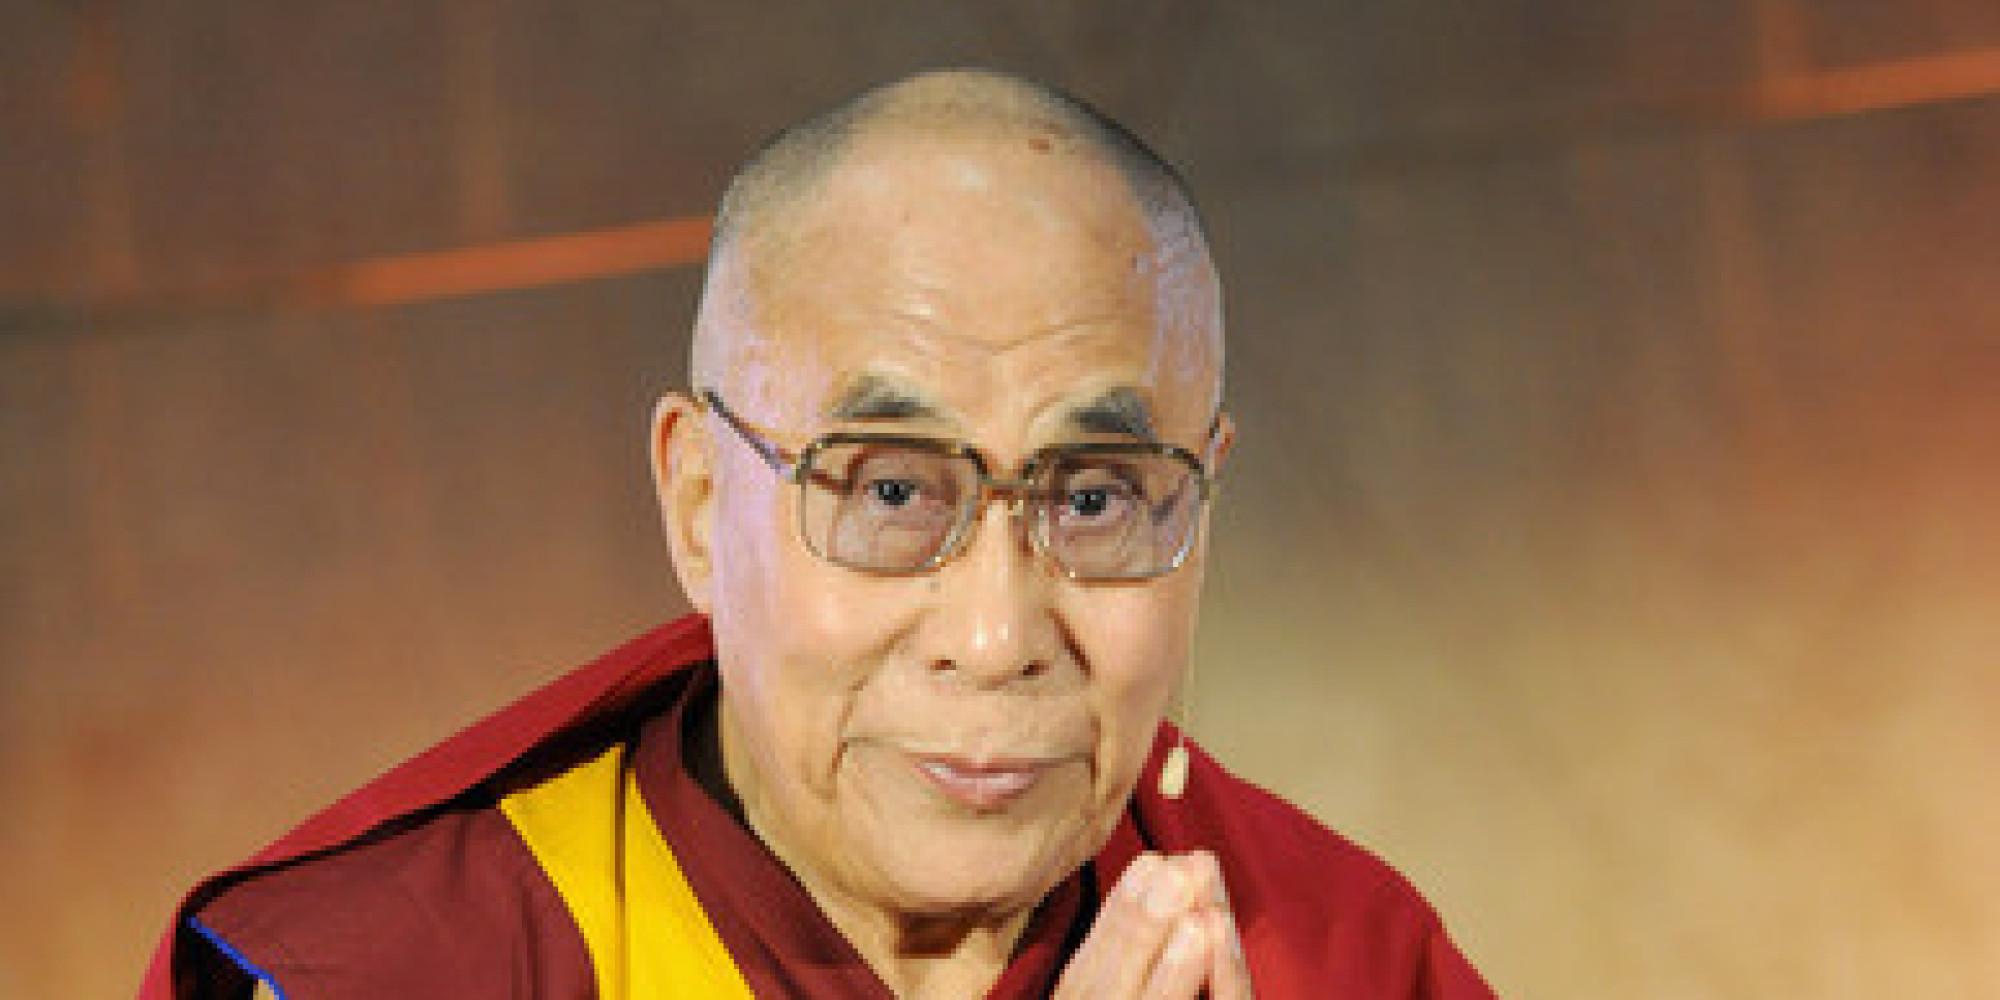 dalai llama The 14th dalai lama (religious name: tenzin gyatso, shortened from jetsun jamphel ngawang lobsang yeshe tenzin gyatso, born lhamo thondup, 6 july 1935) is the current.